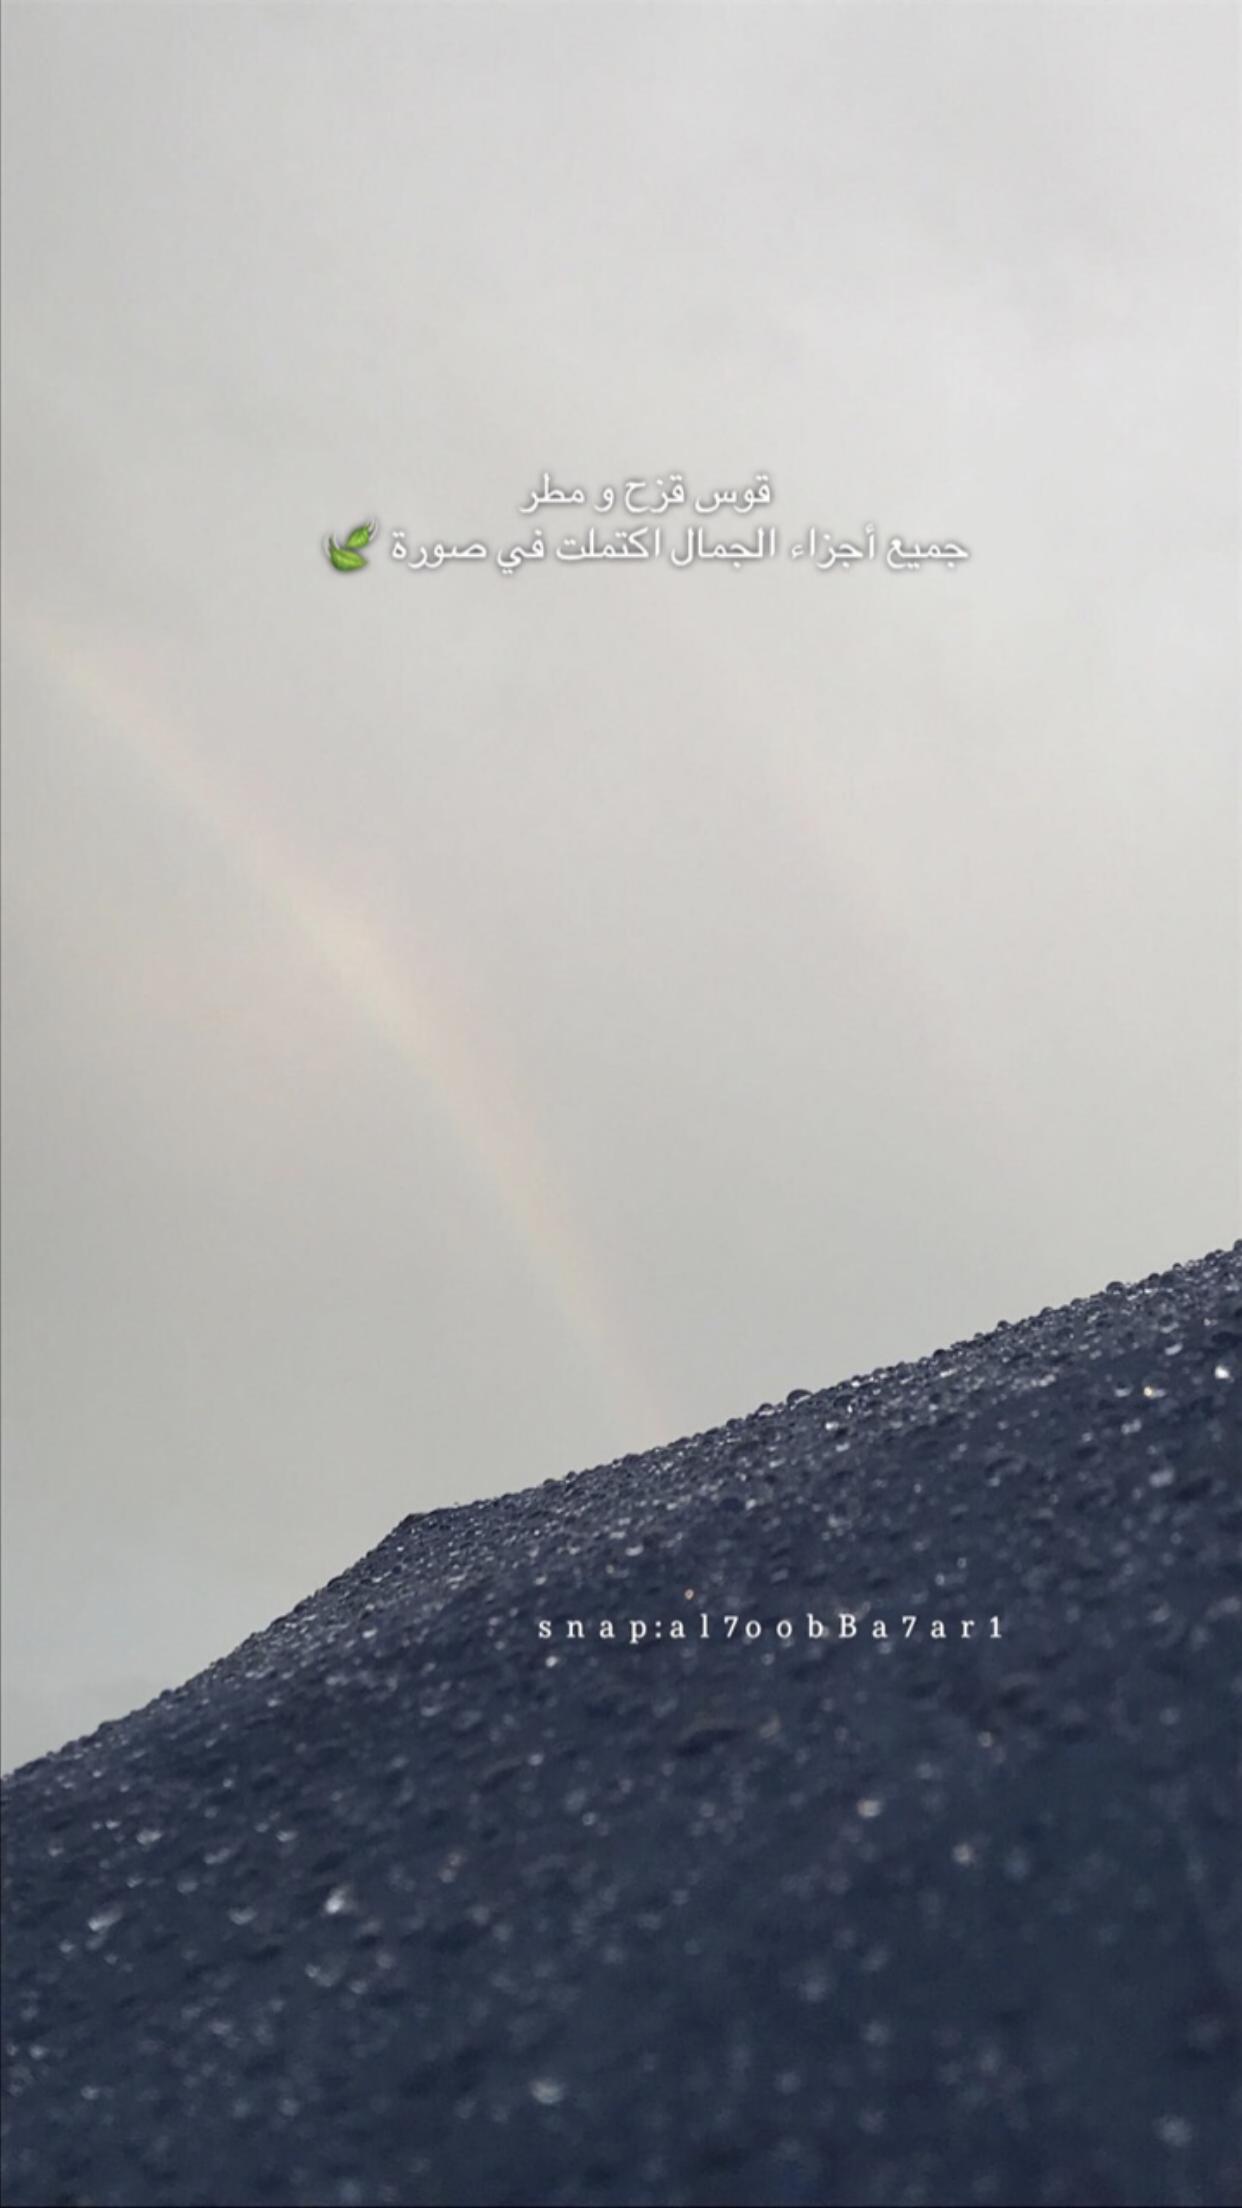 Snap Al7oobba7ar1 Lockscreen Outdoor Lockscreen Screenshot